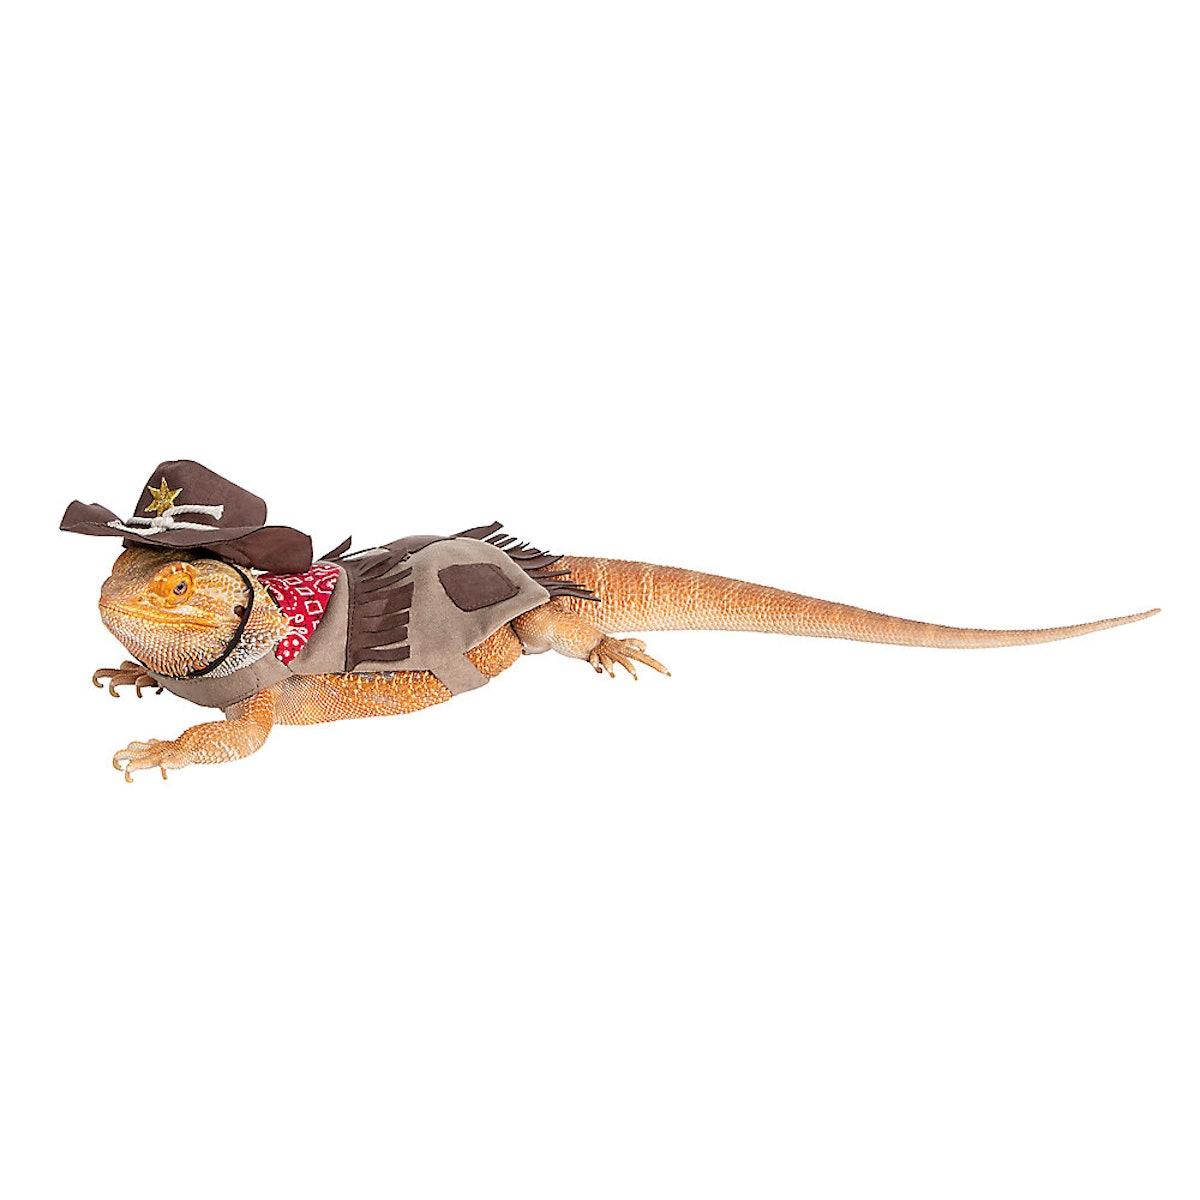 Thrills & Chills Cowboy Reptile Costume